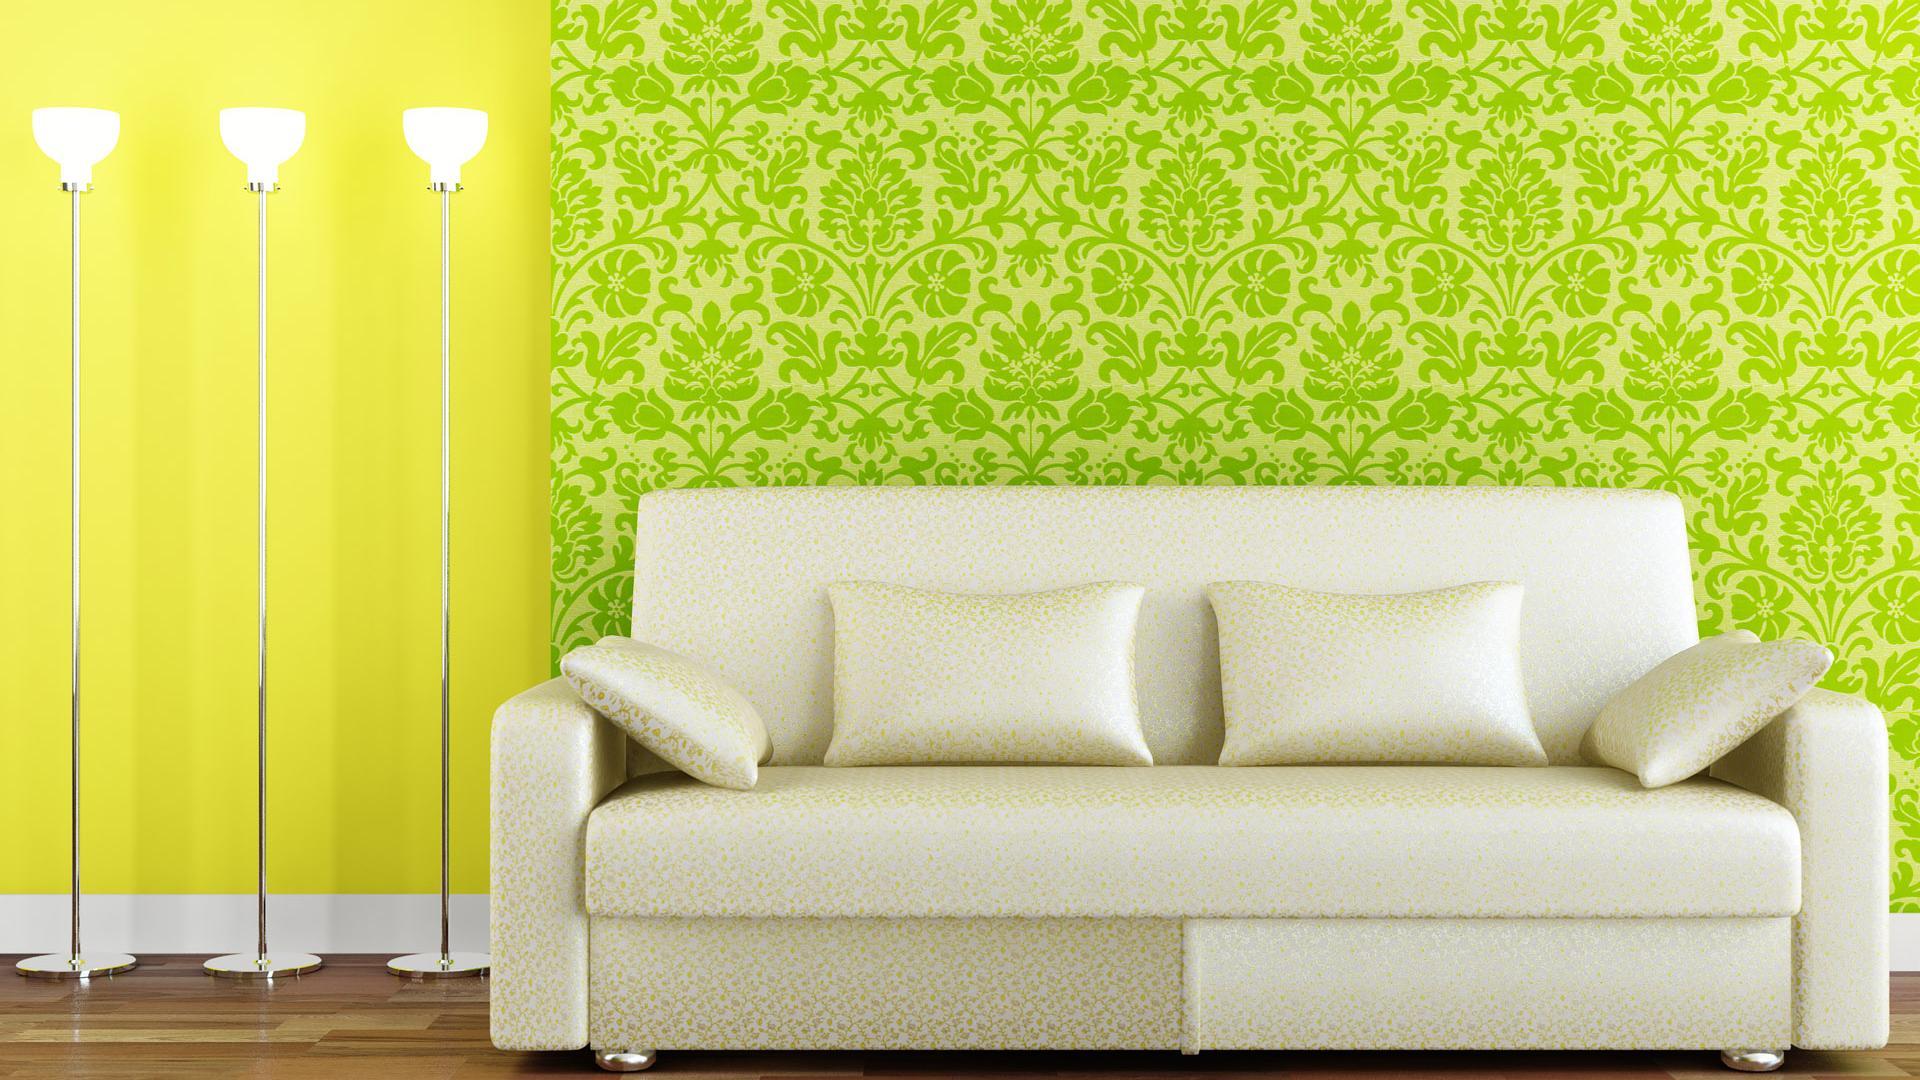 Green Living Room Designs 1920x1080